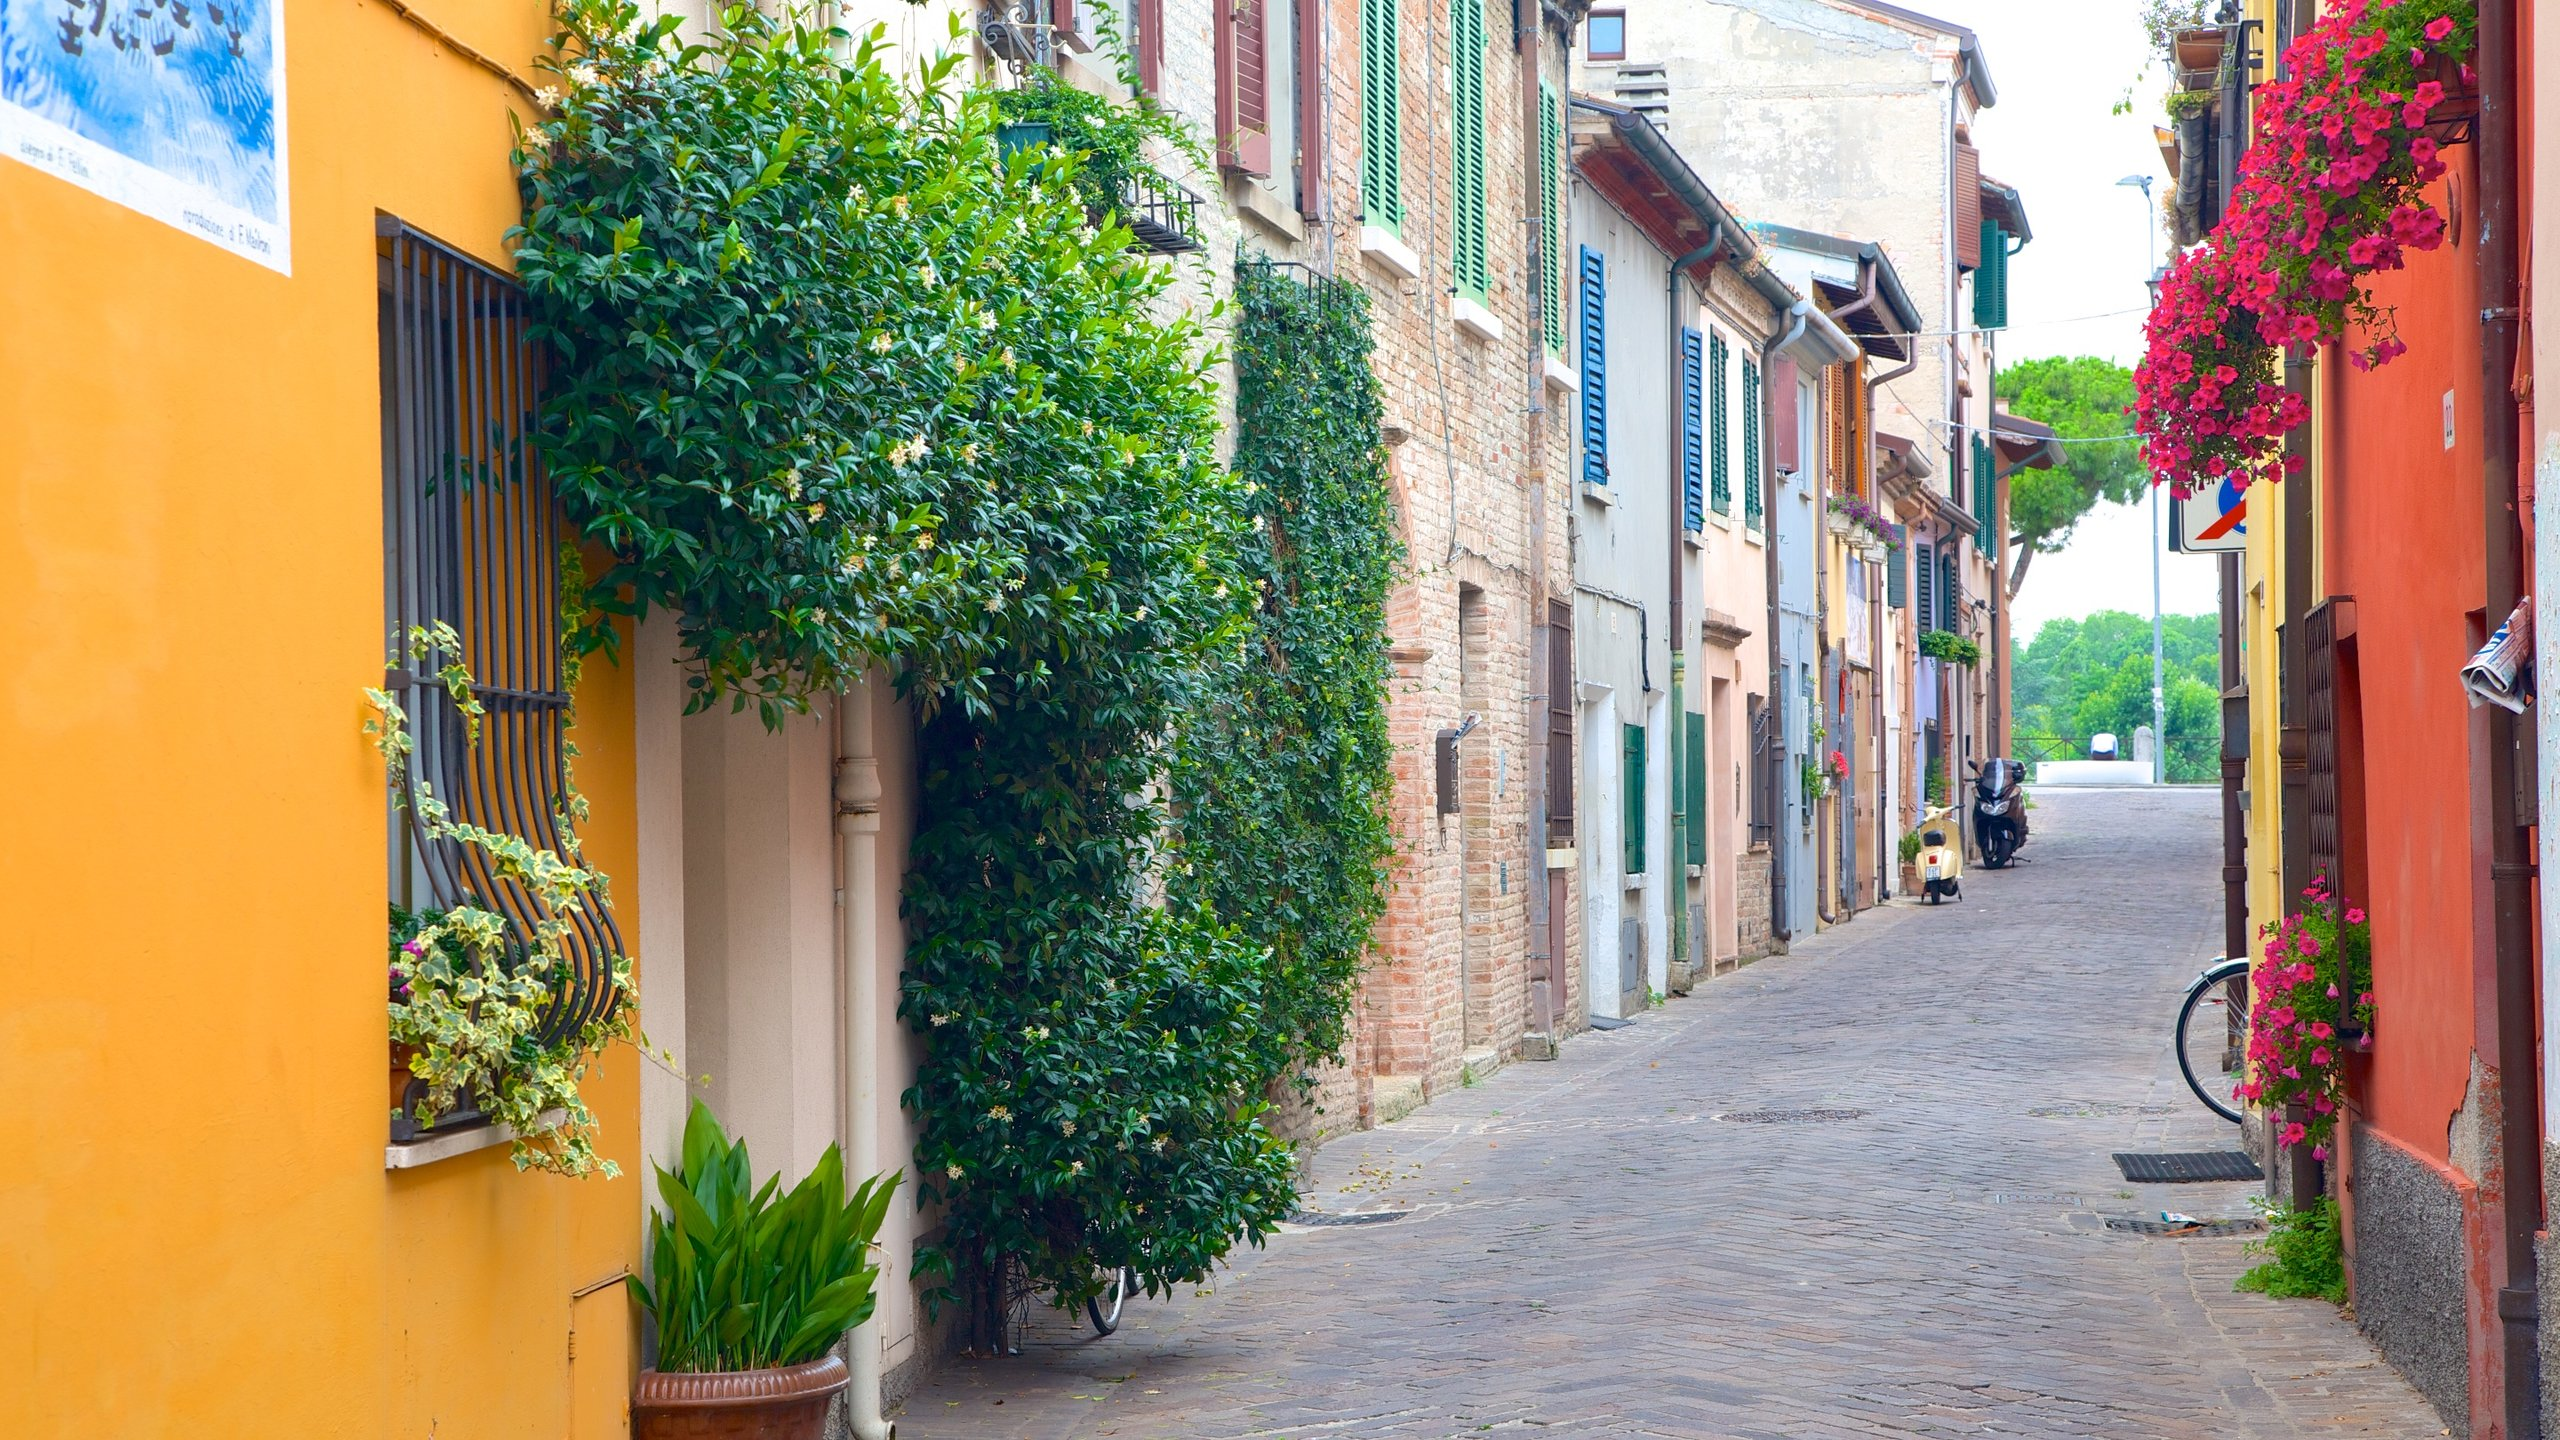 Province of Forli-Cesena, Emilia-Romagna, Italy